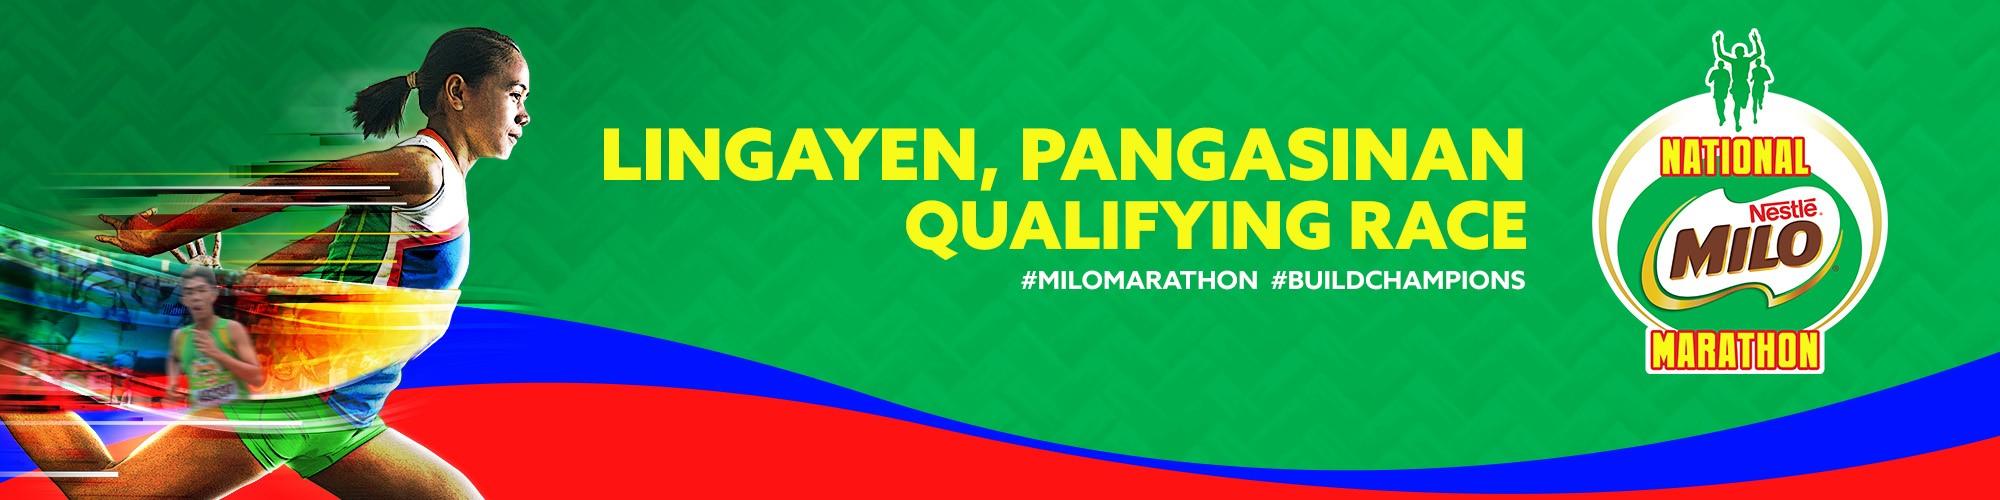 2019 National MILO Marathon Lingayen